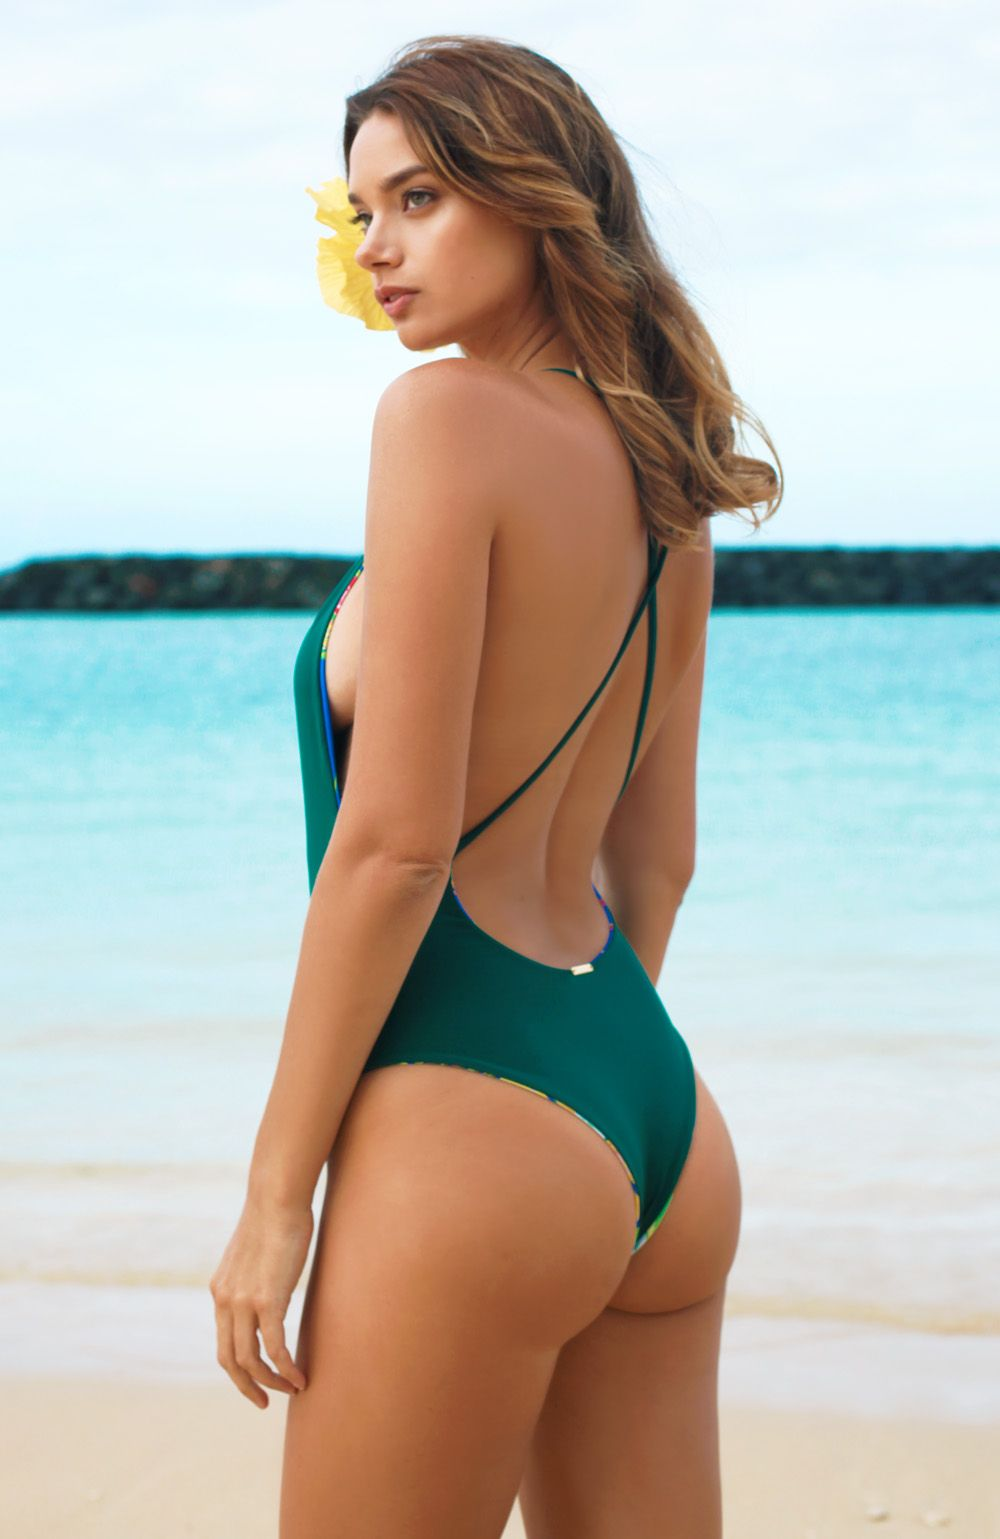 039e572be6 VINTAGE ALOHA Limu & Luana Cross-Back Monokini San Lorenzo Bikini, One  Piece Suit